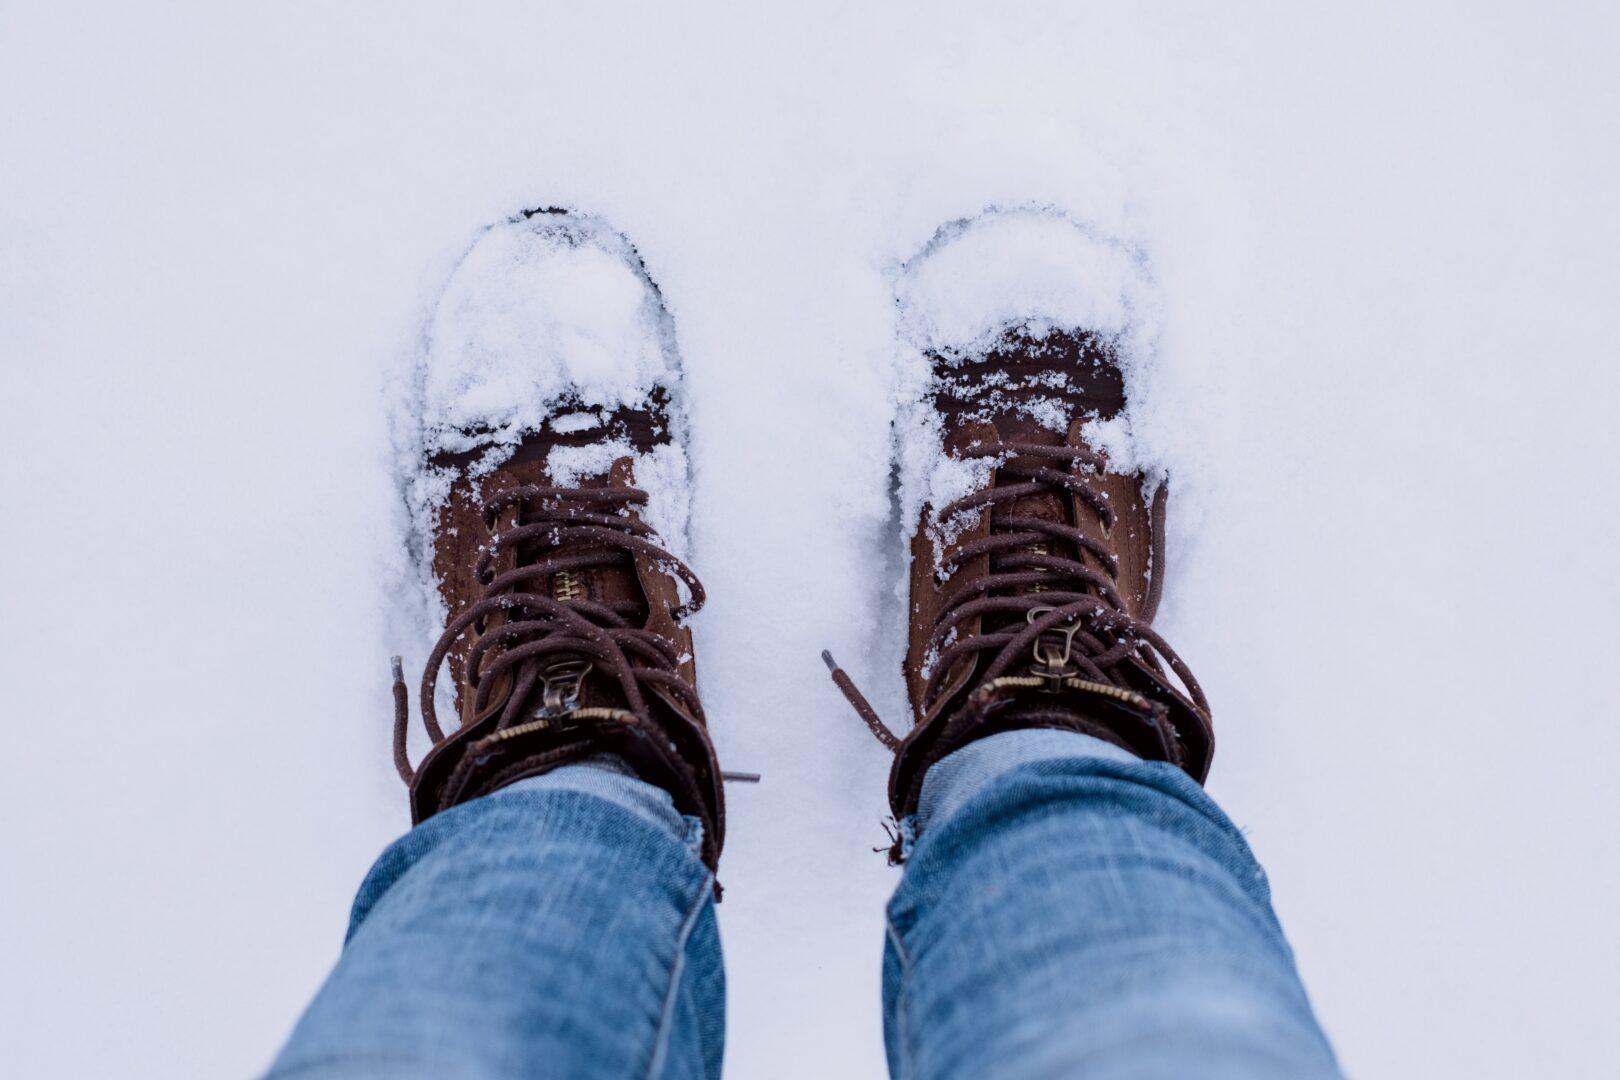 Zimski čevlji niso snežni čevlji.